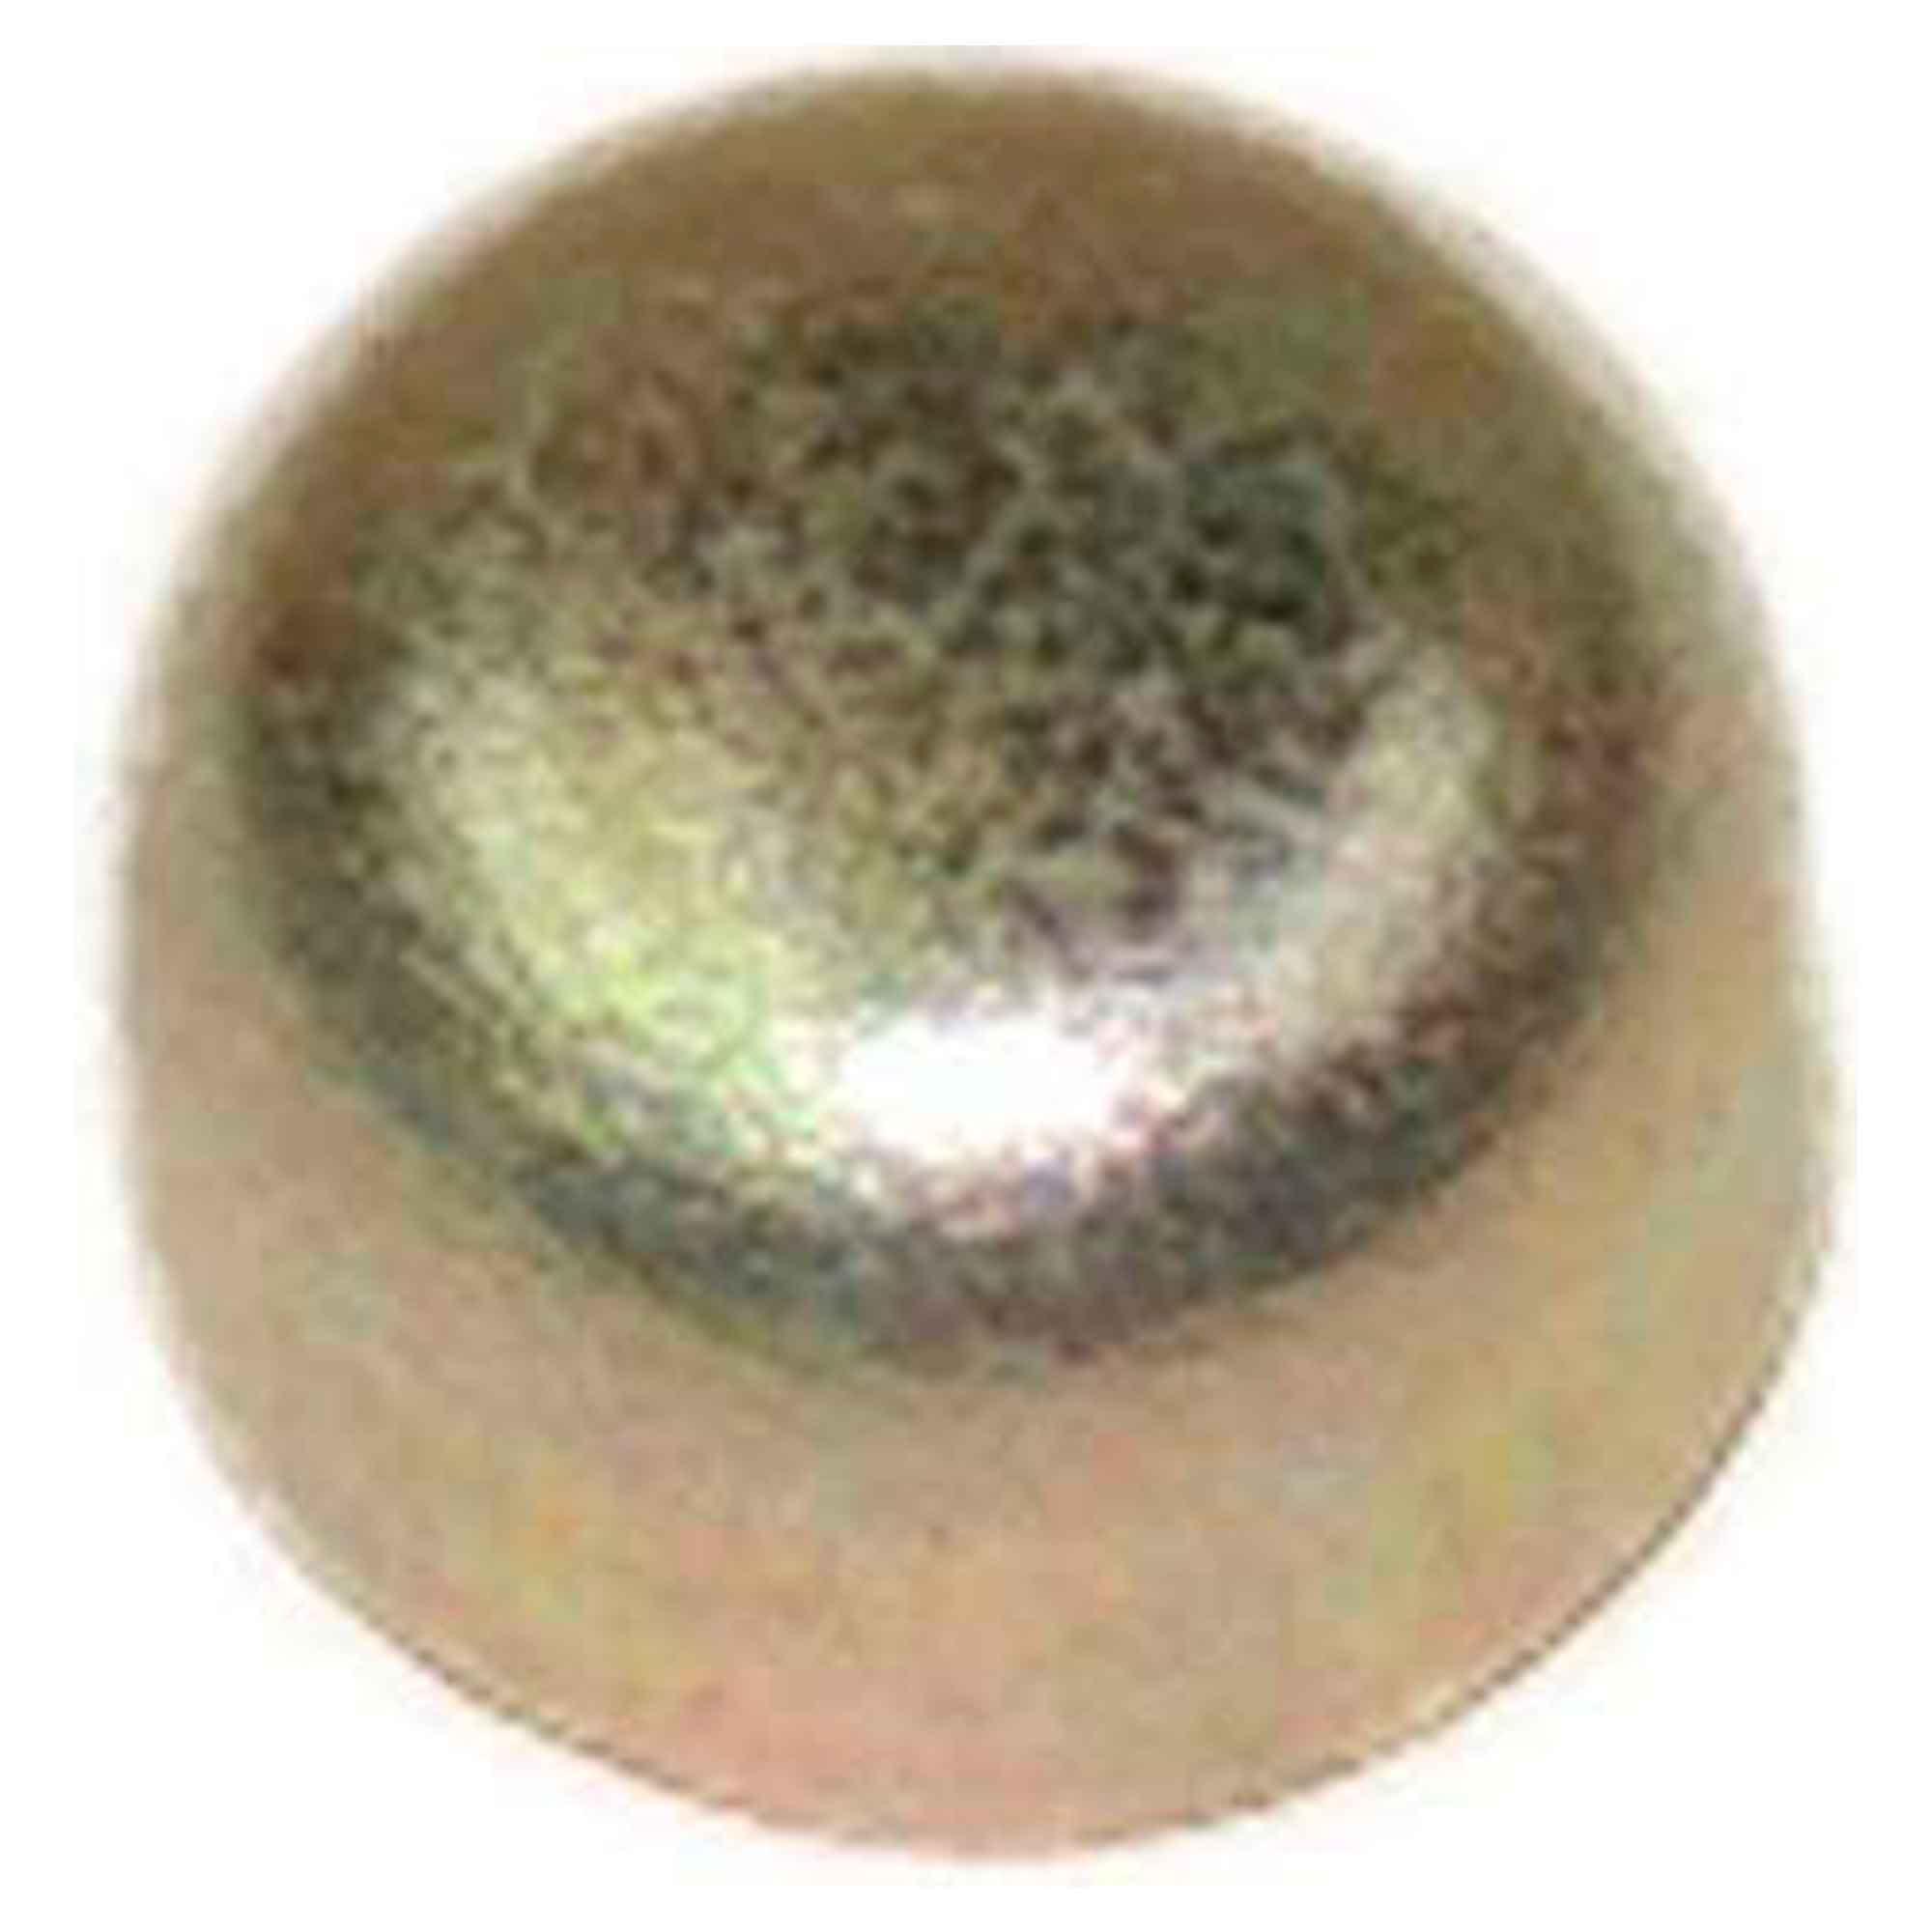 SUK519 - Bujão expansivo 9,70MM